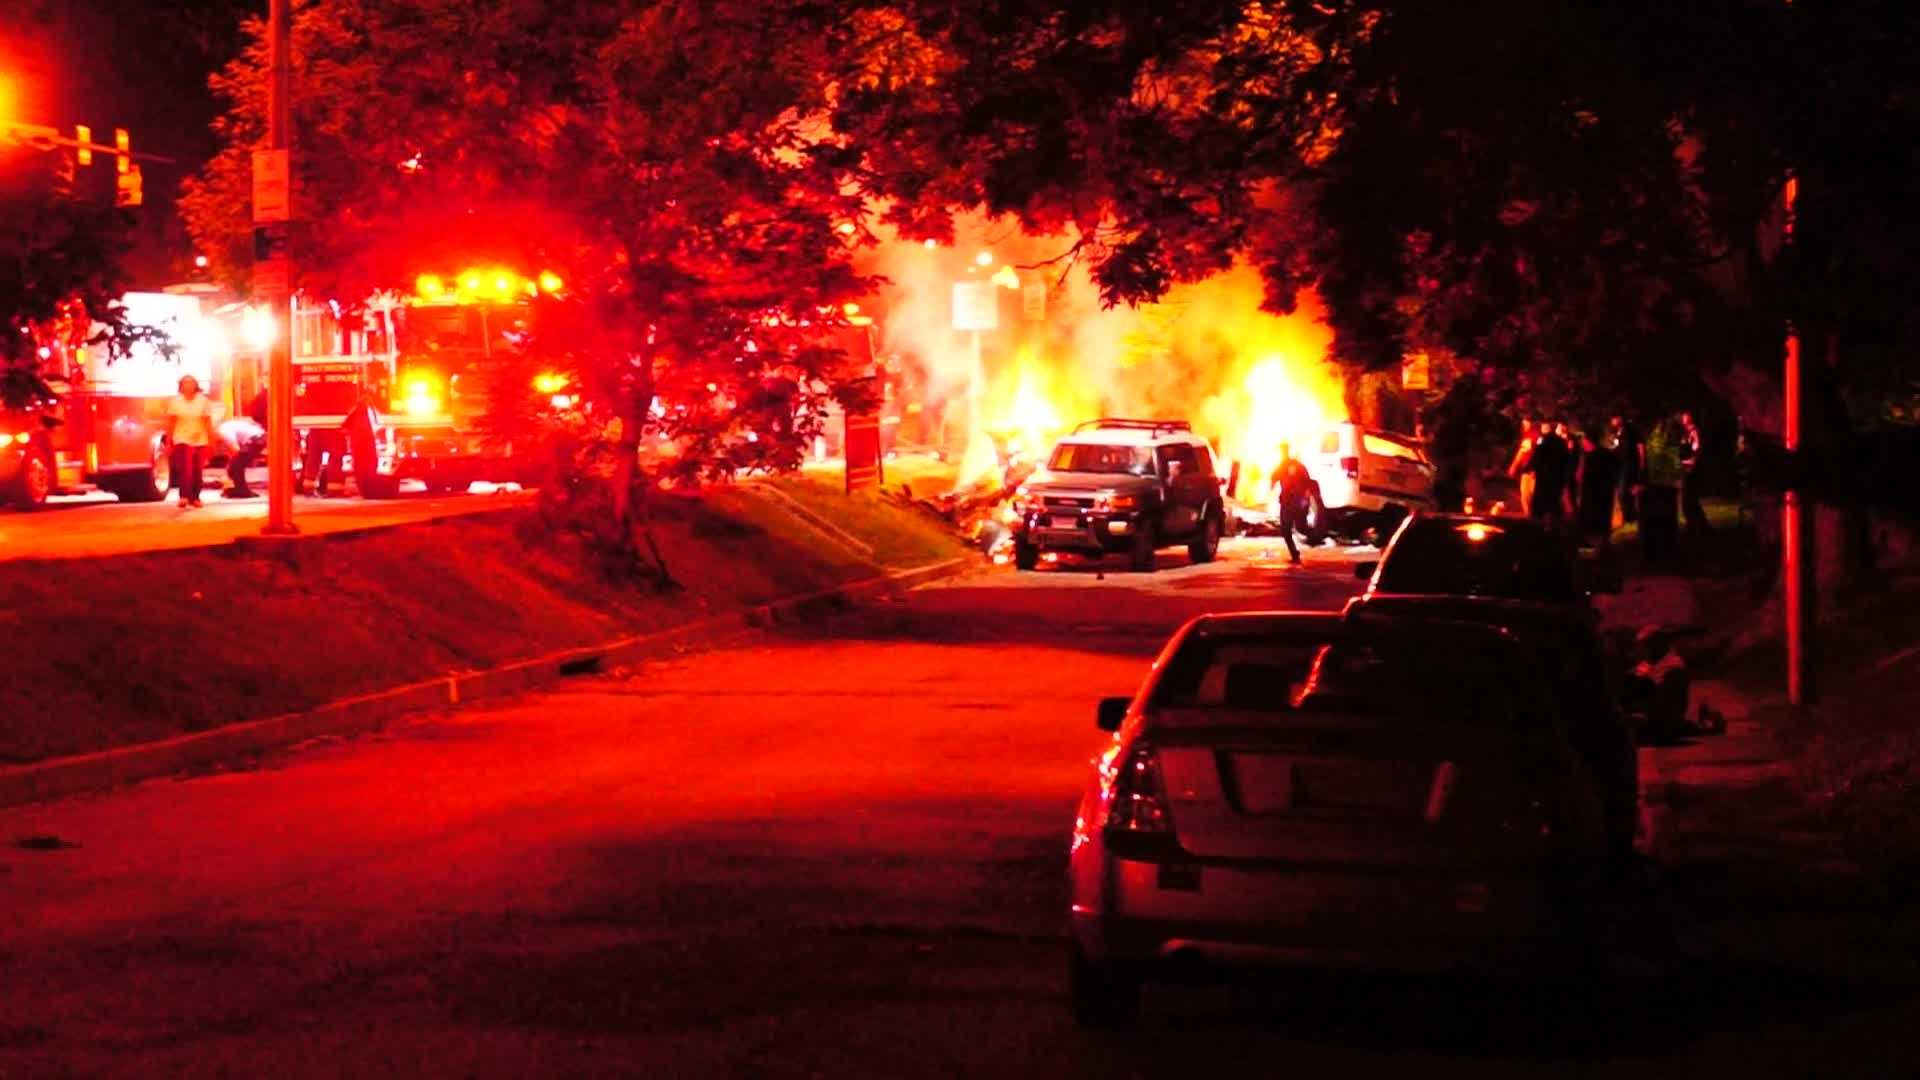 Cellphone video shows fiery crash scene